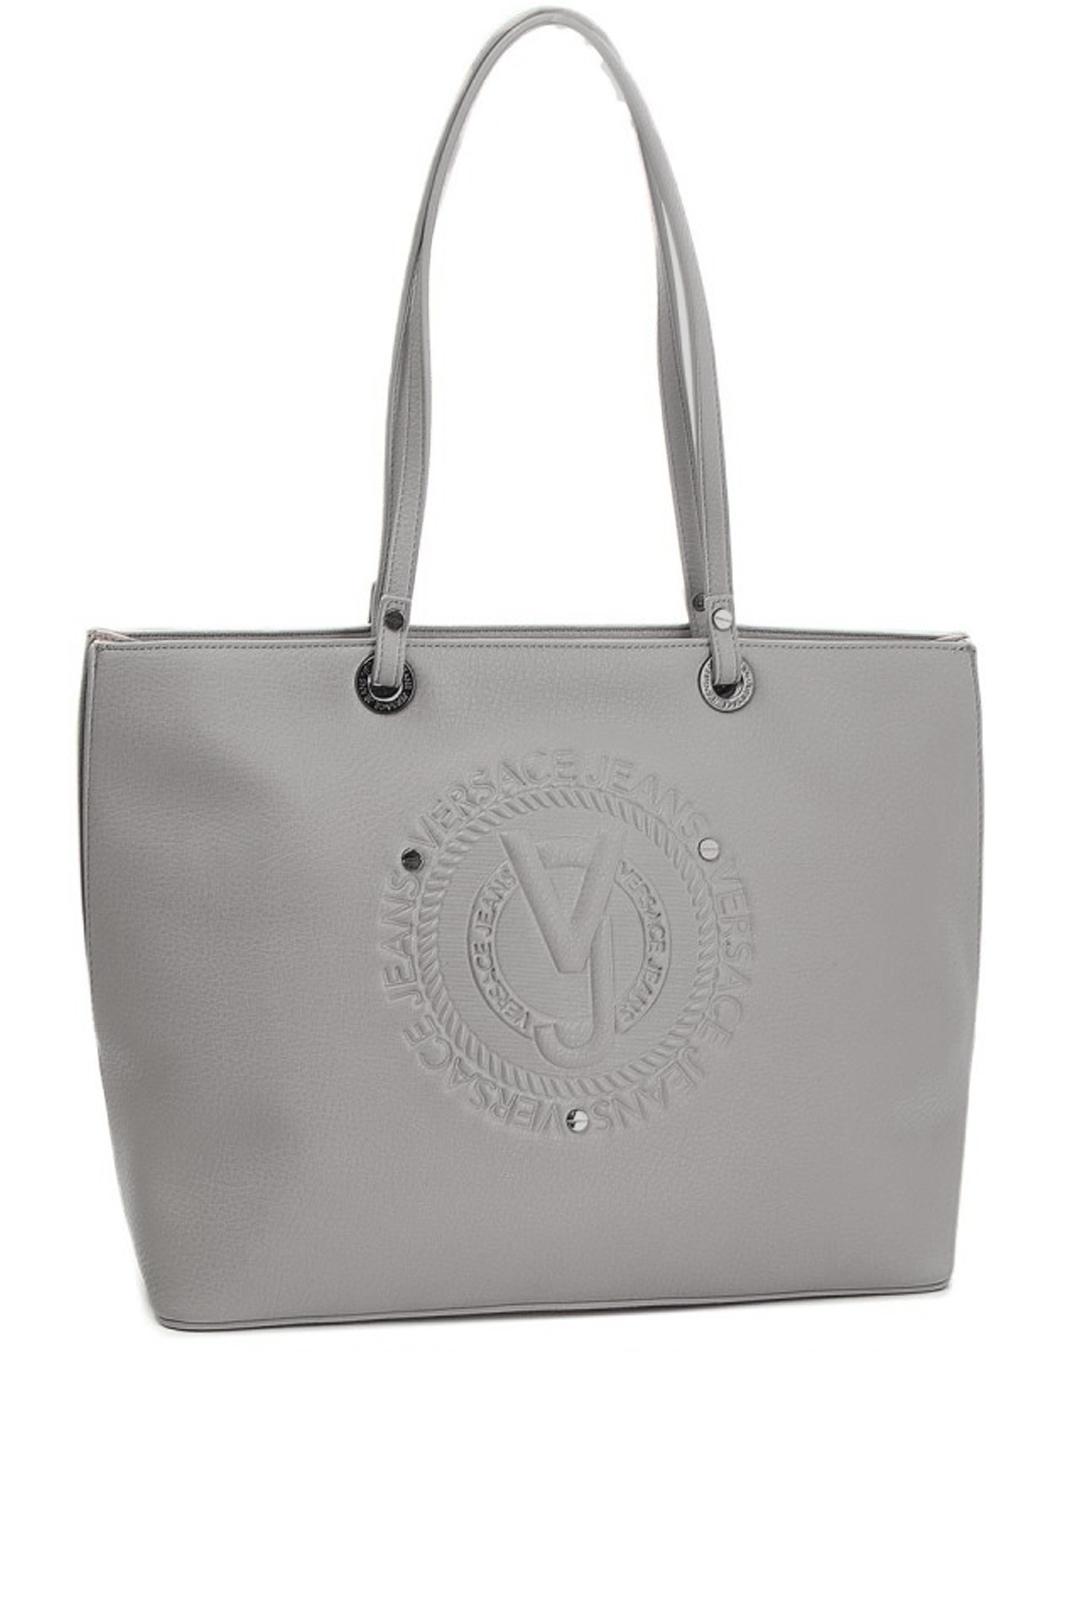 Cabas / Sacs shopping  Versace Jeans VSBBX2 829 GREY